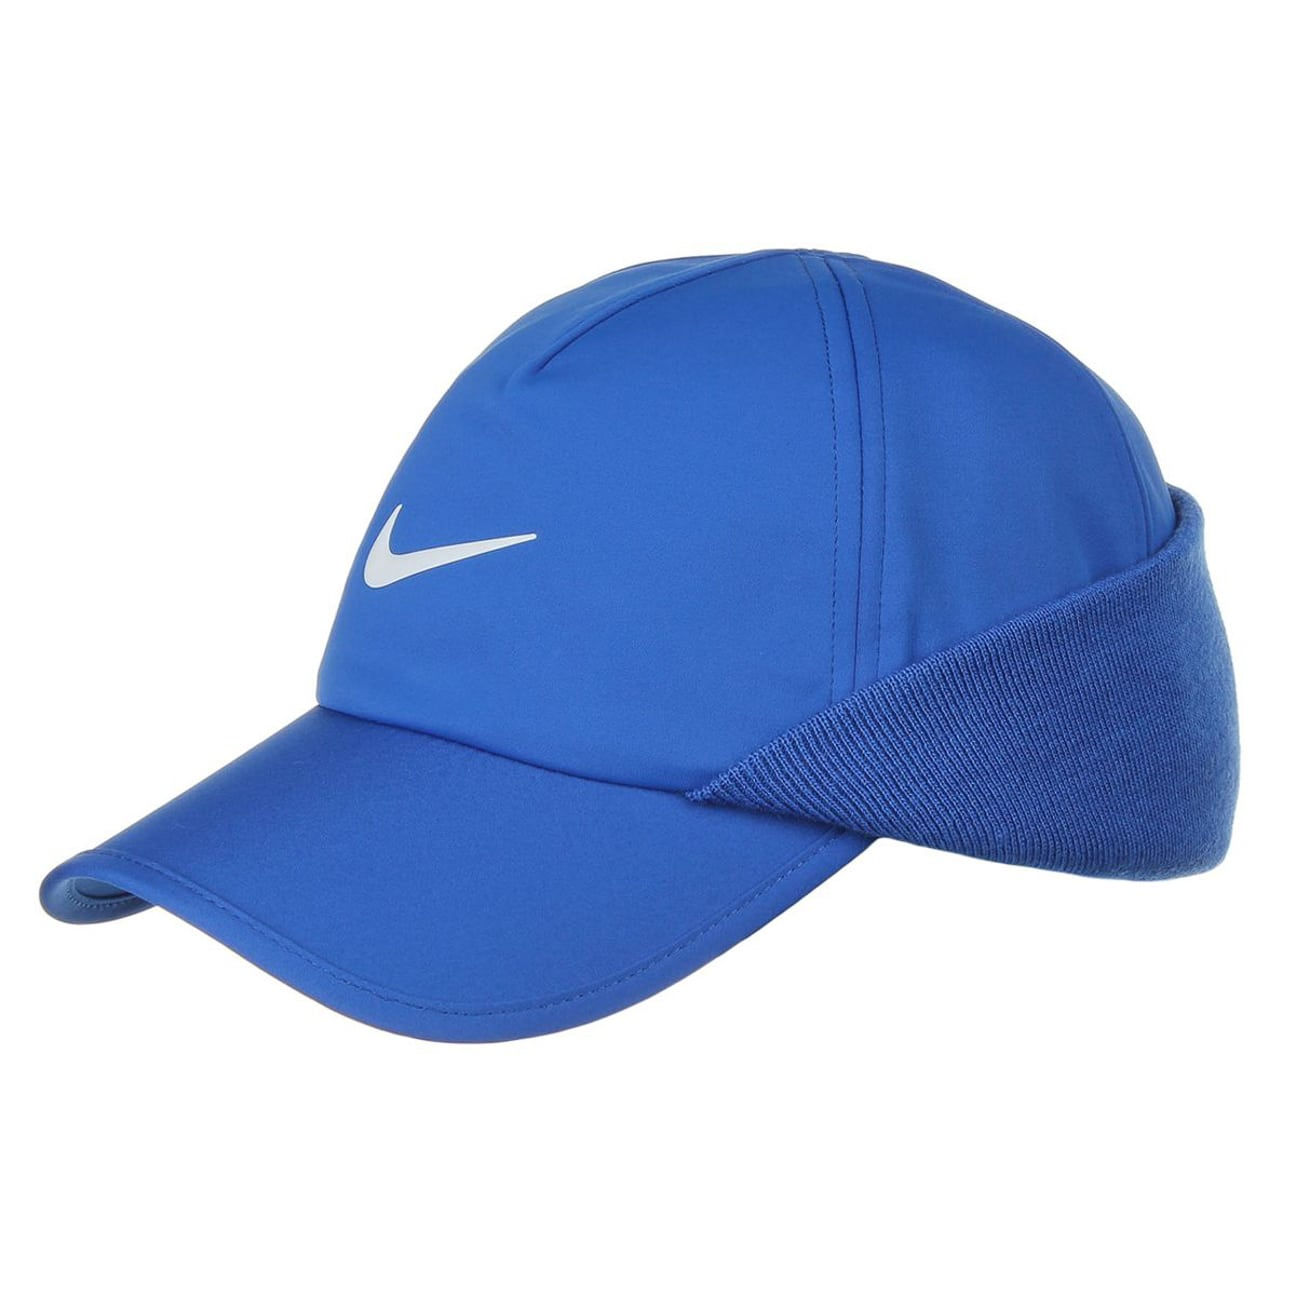 1b975fabb3aad ... Winter Protect Baseball Cap by Nike - royal-blue 1